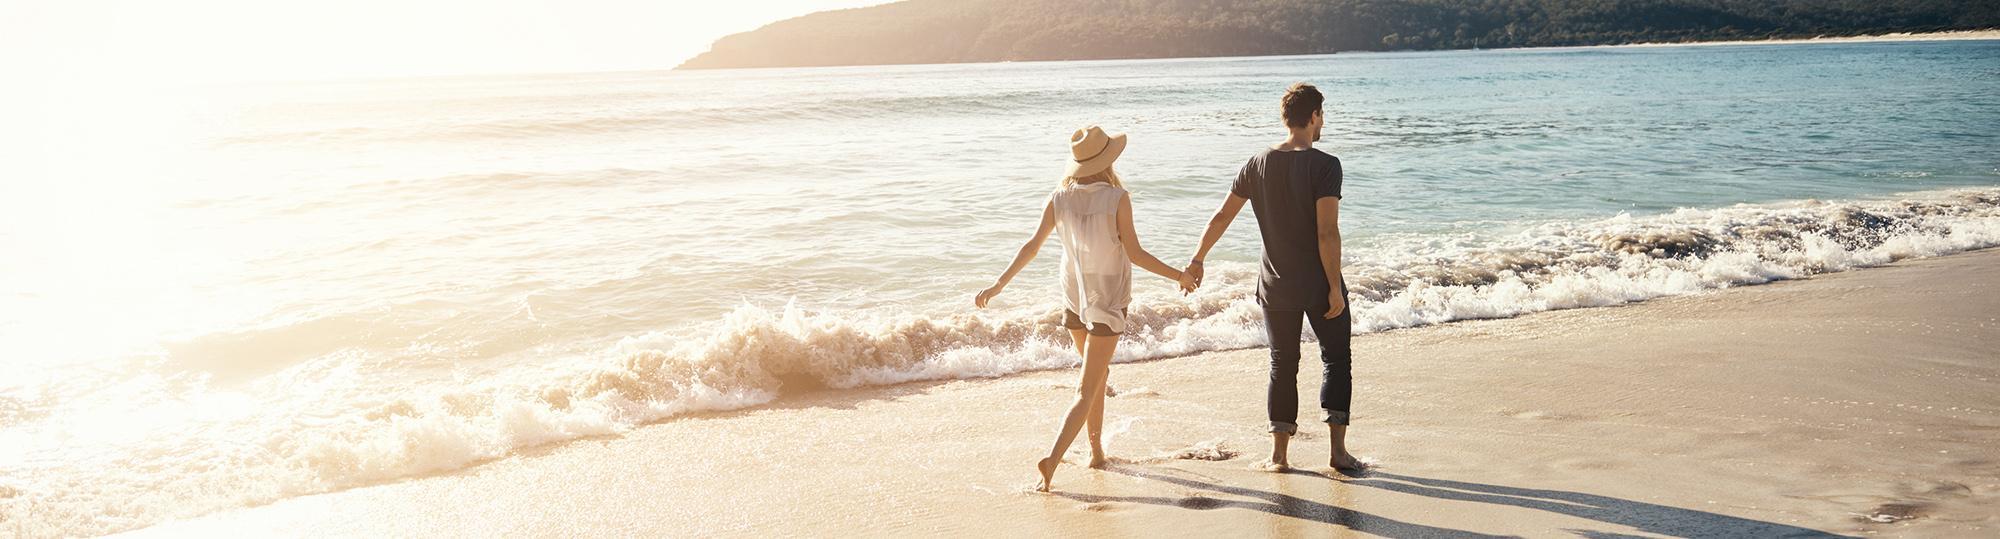 couples deal hero on the beach